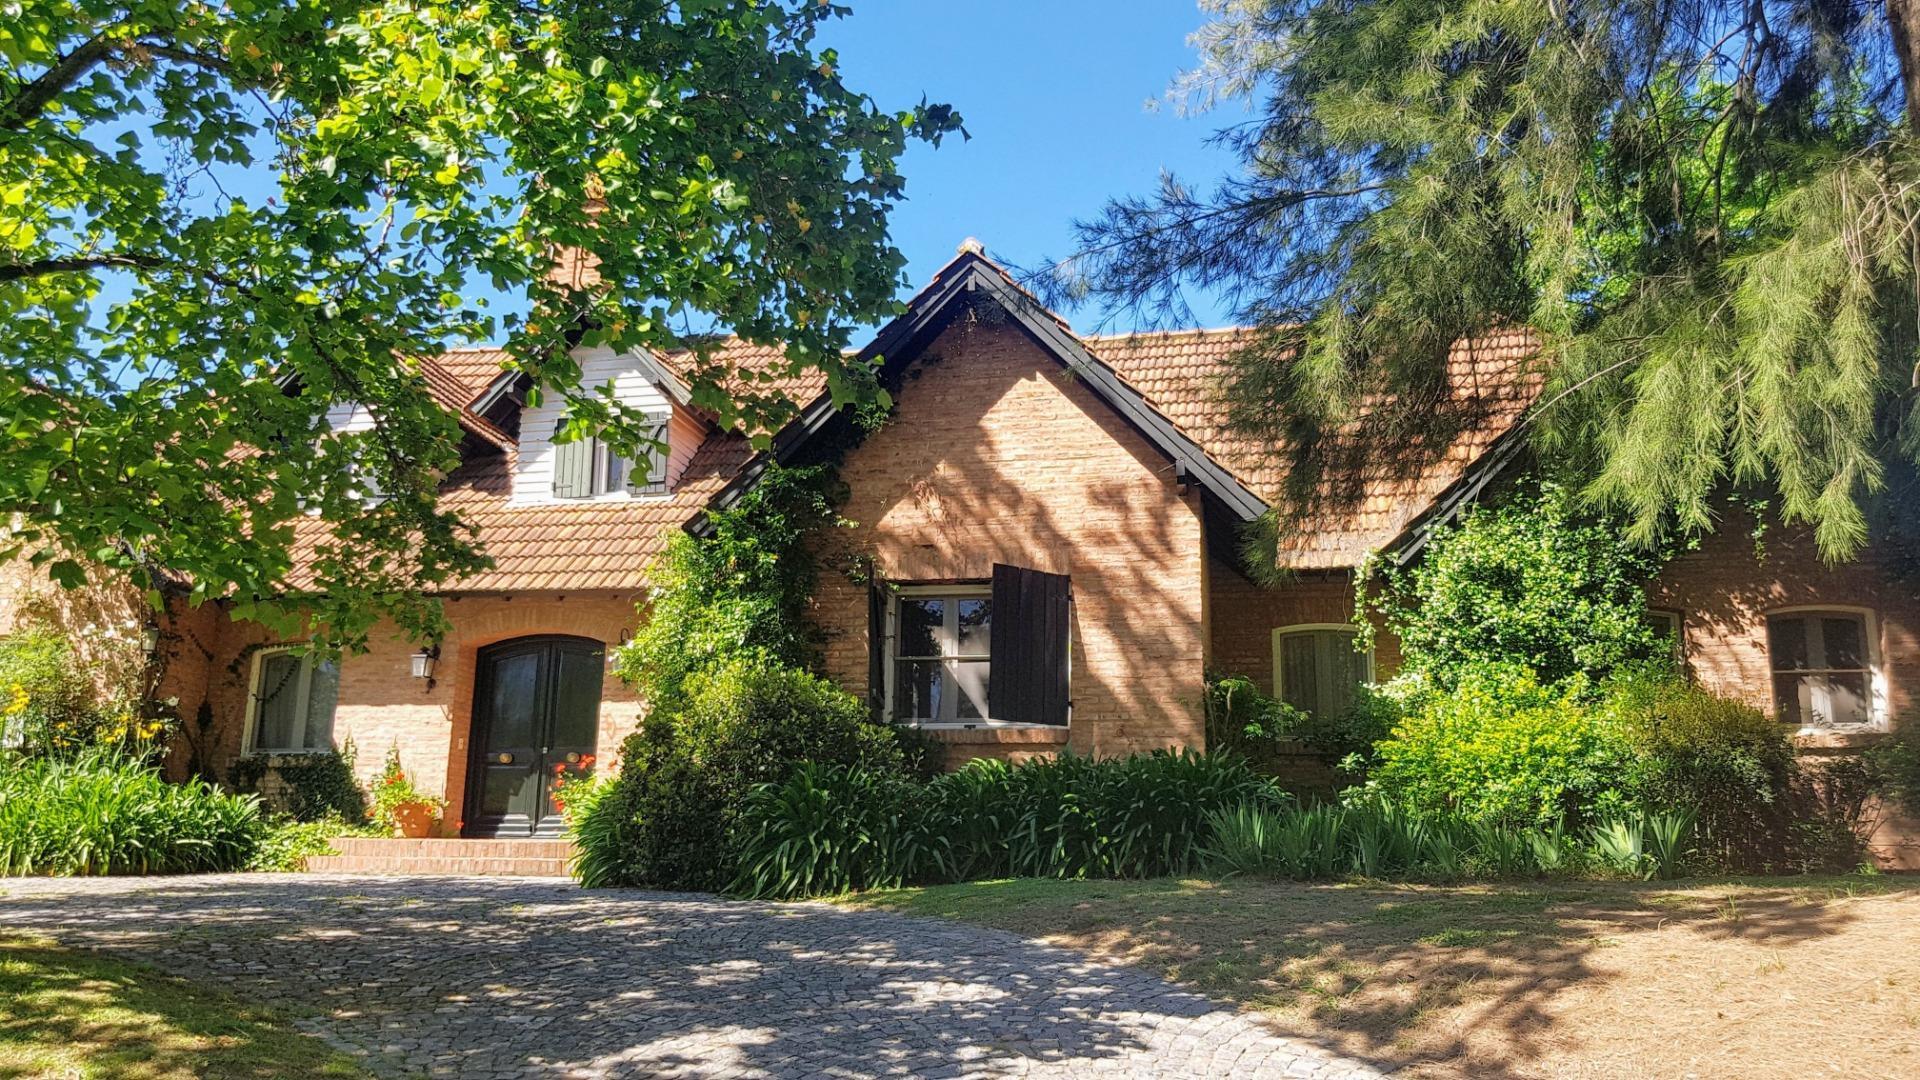 Casa en venta con pileta en barrio Martindale CC, Pilar - Foto 33